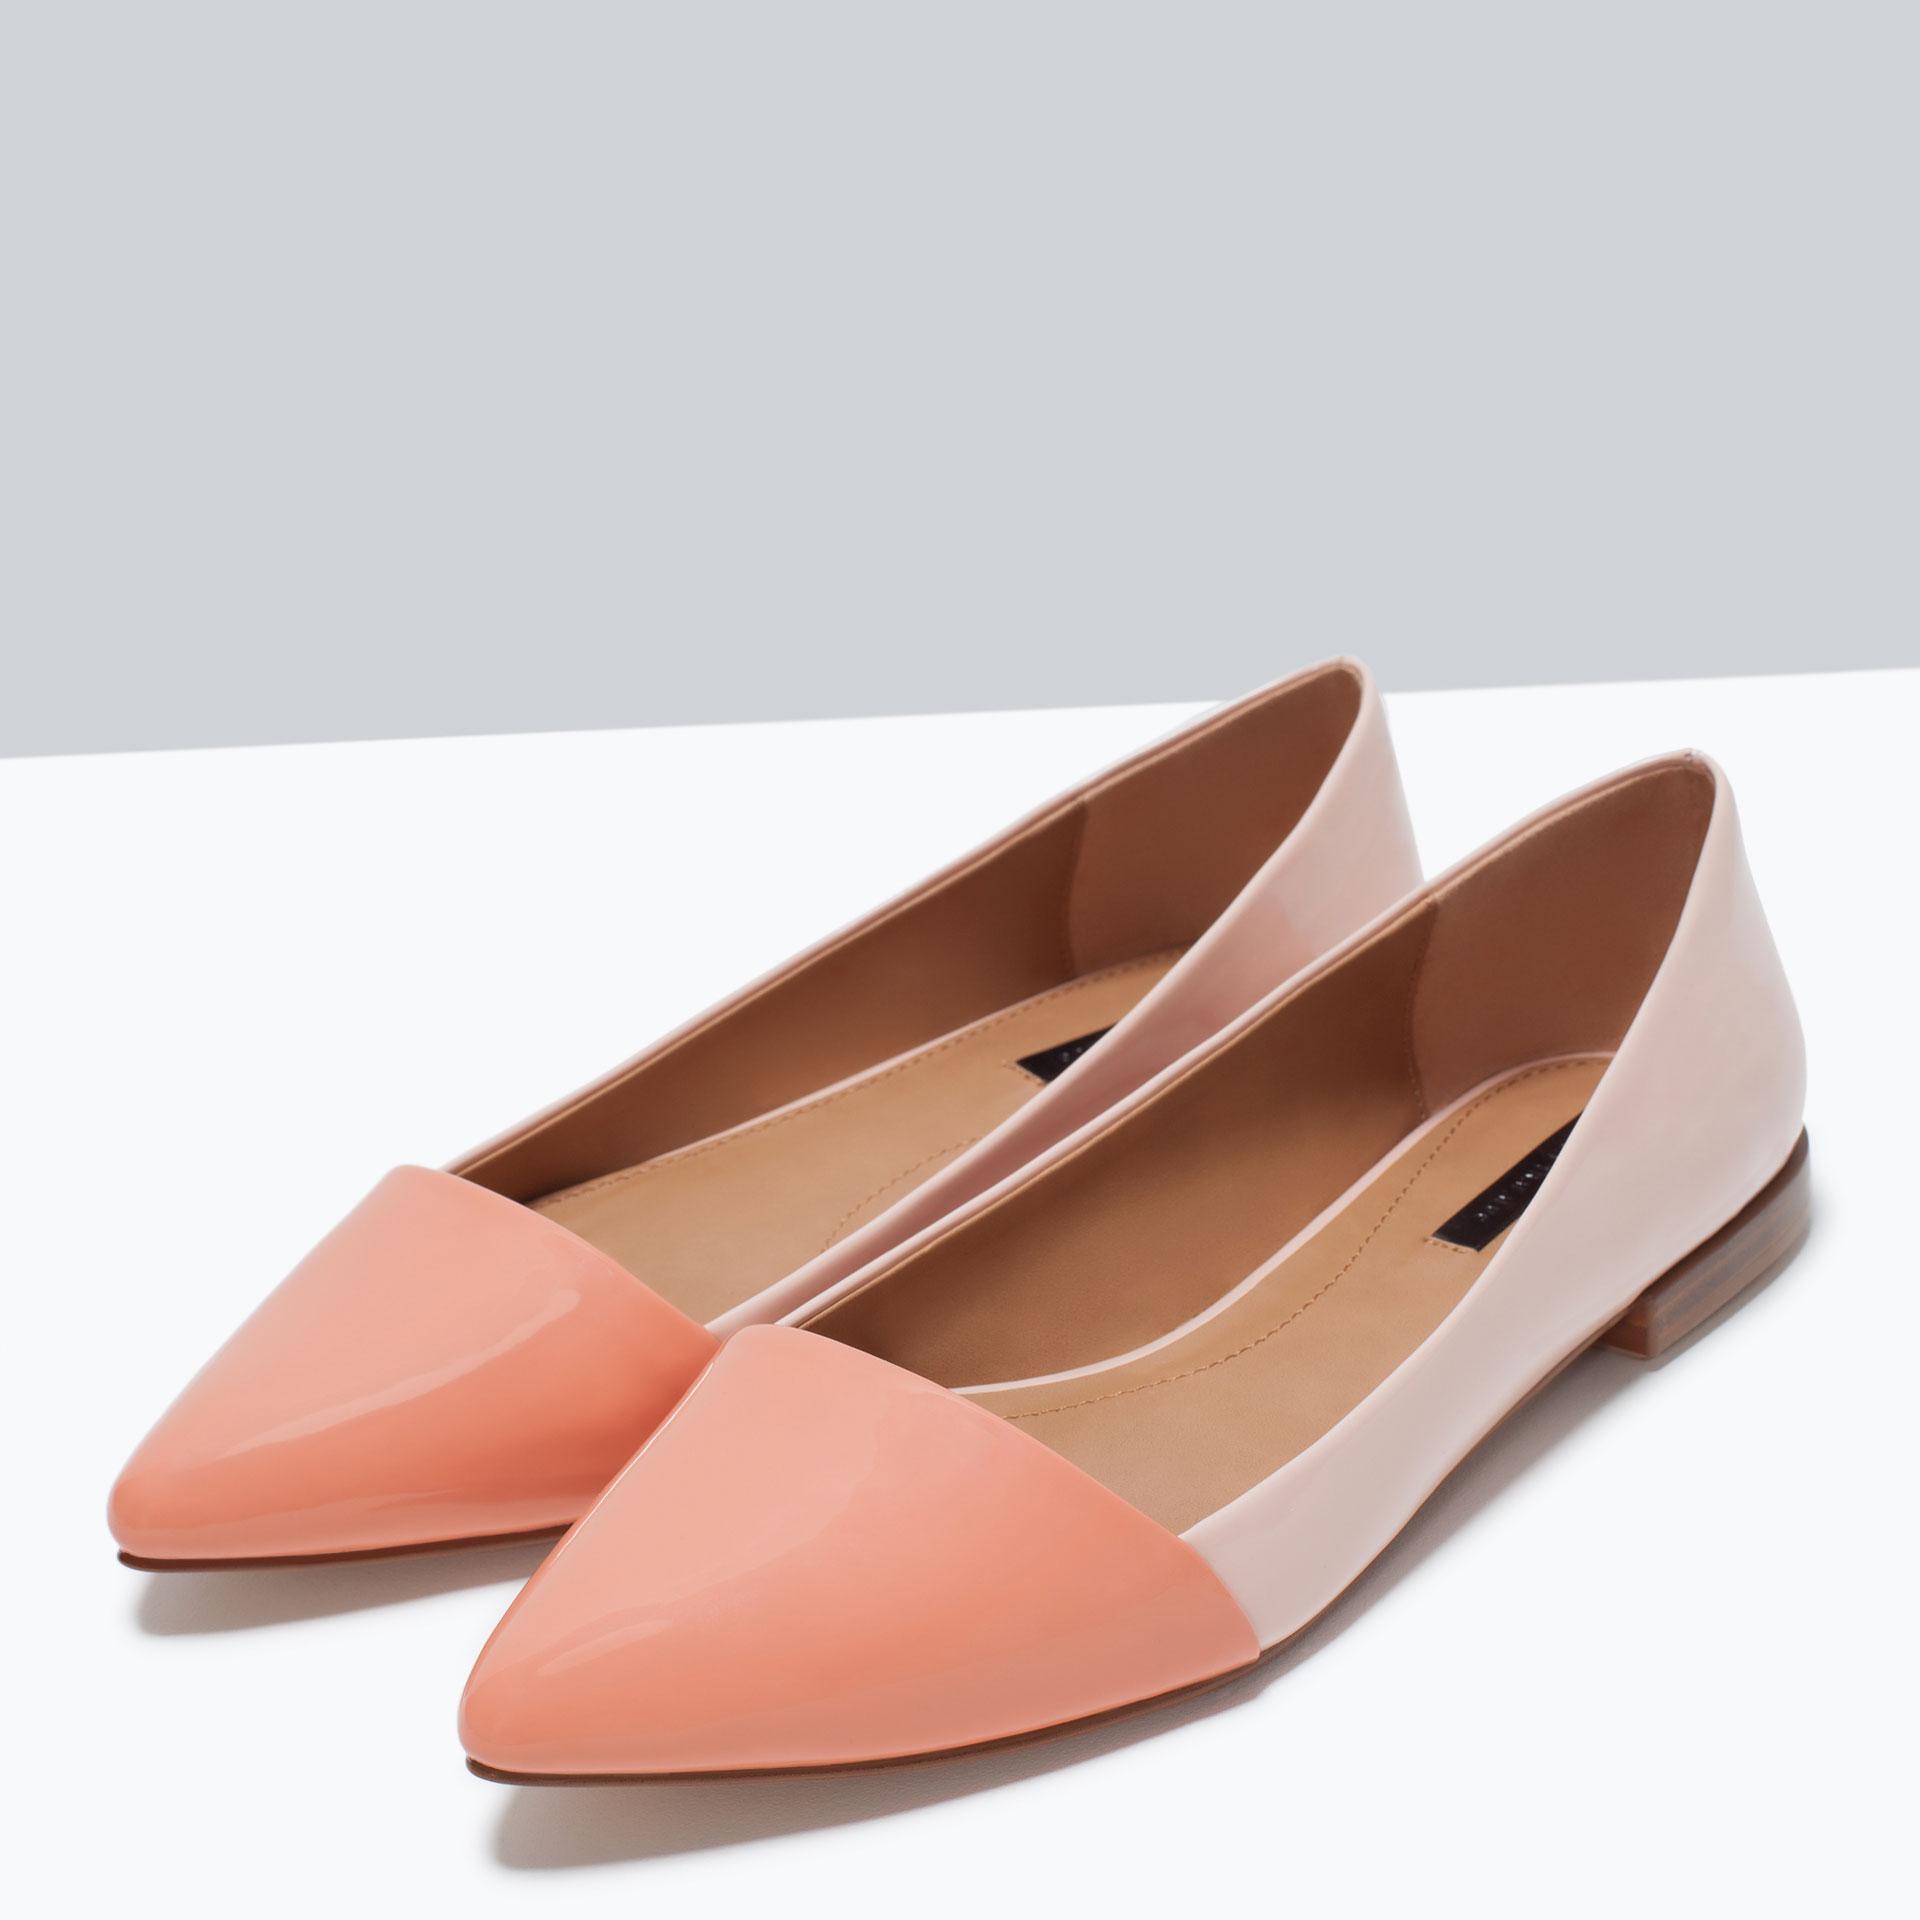 Zara Shoes Flats Uk